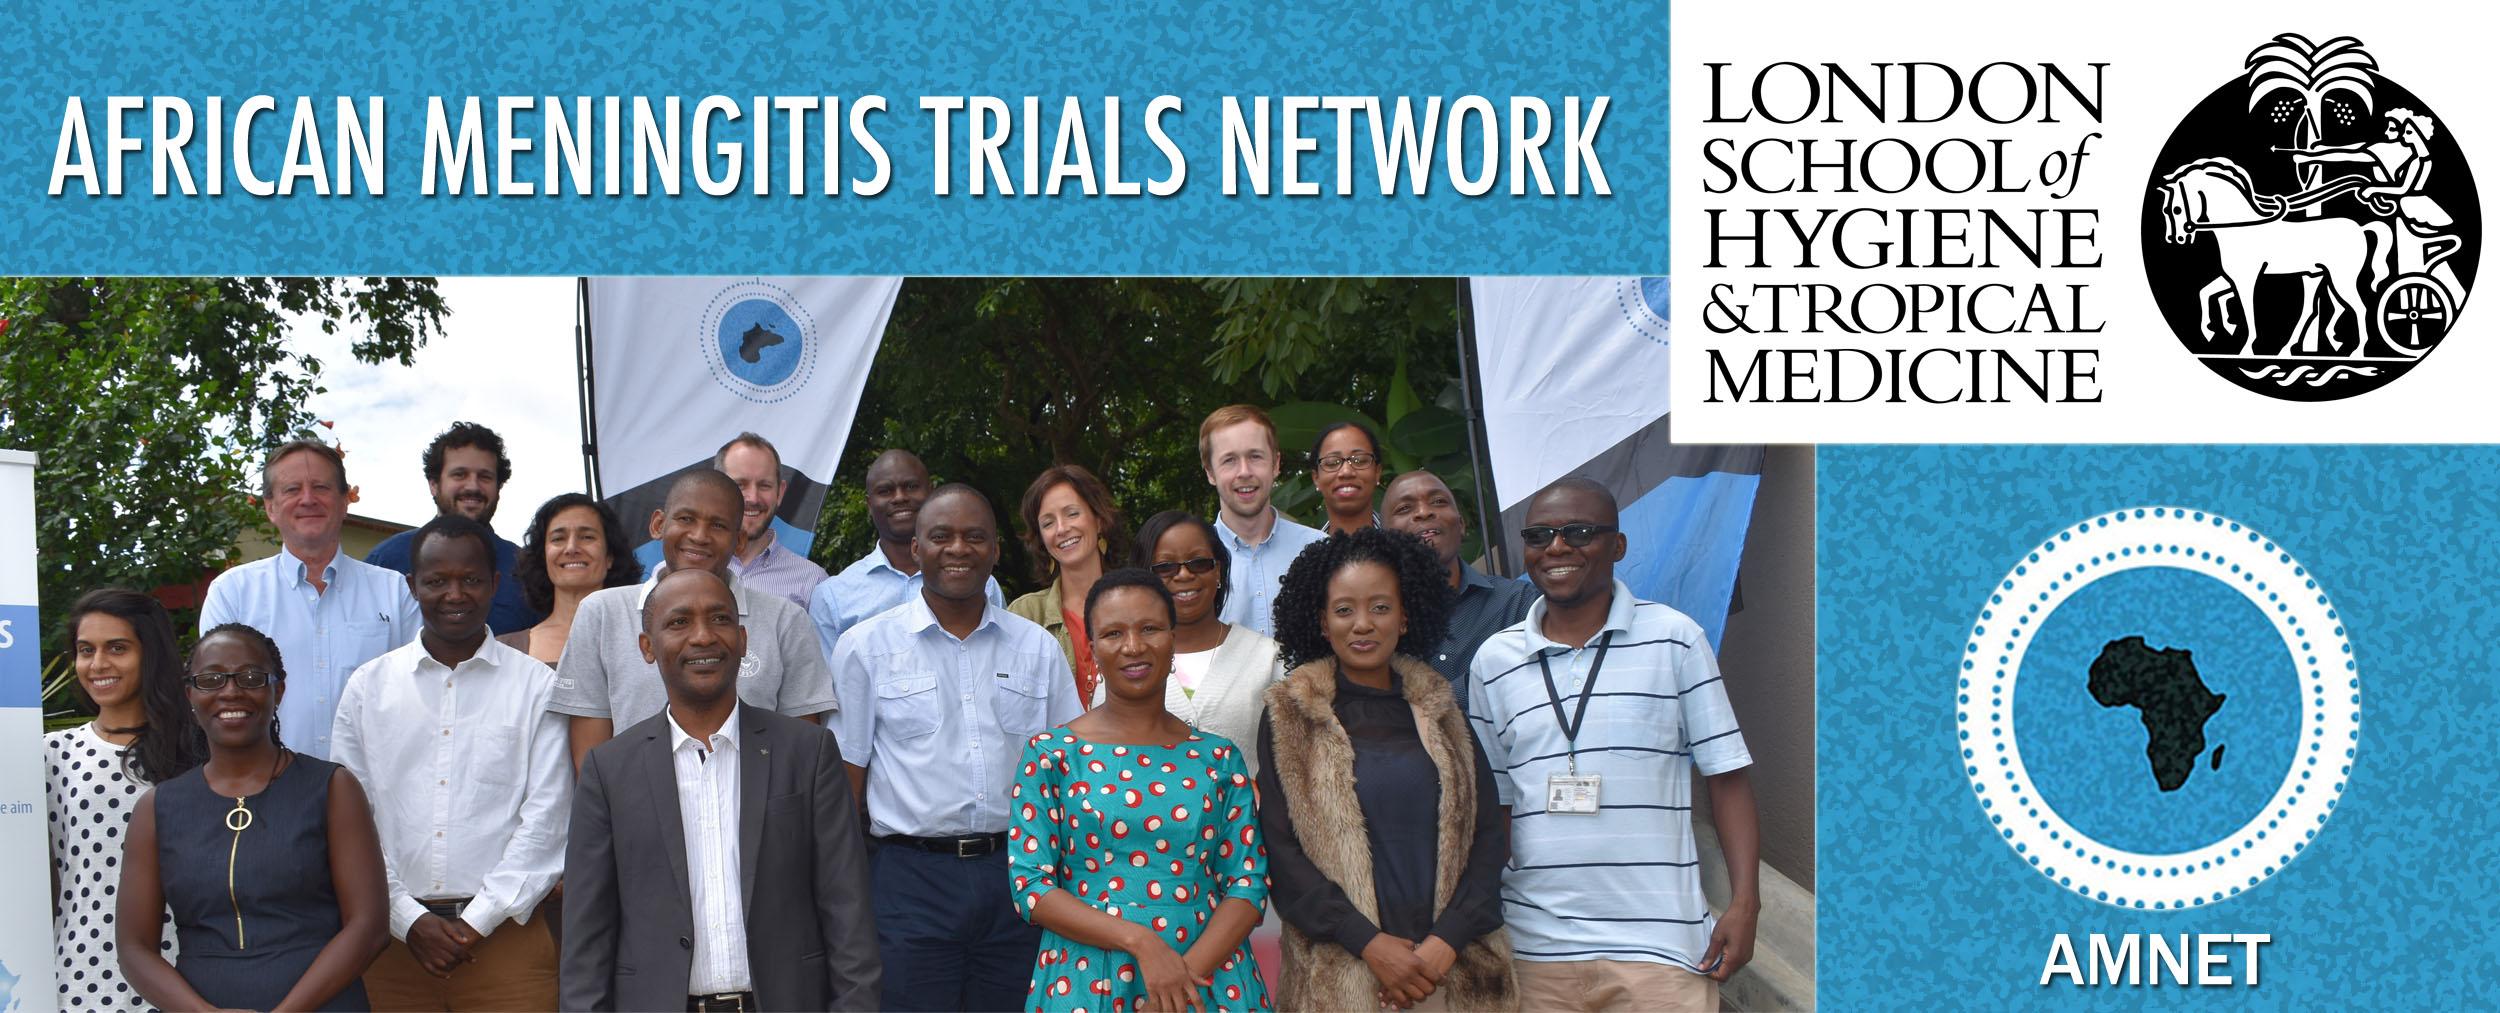 African Meningitis Trials Network (AMNET)